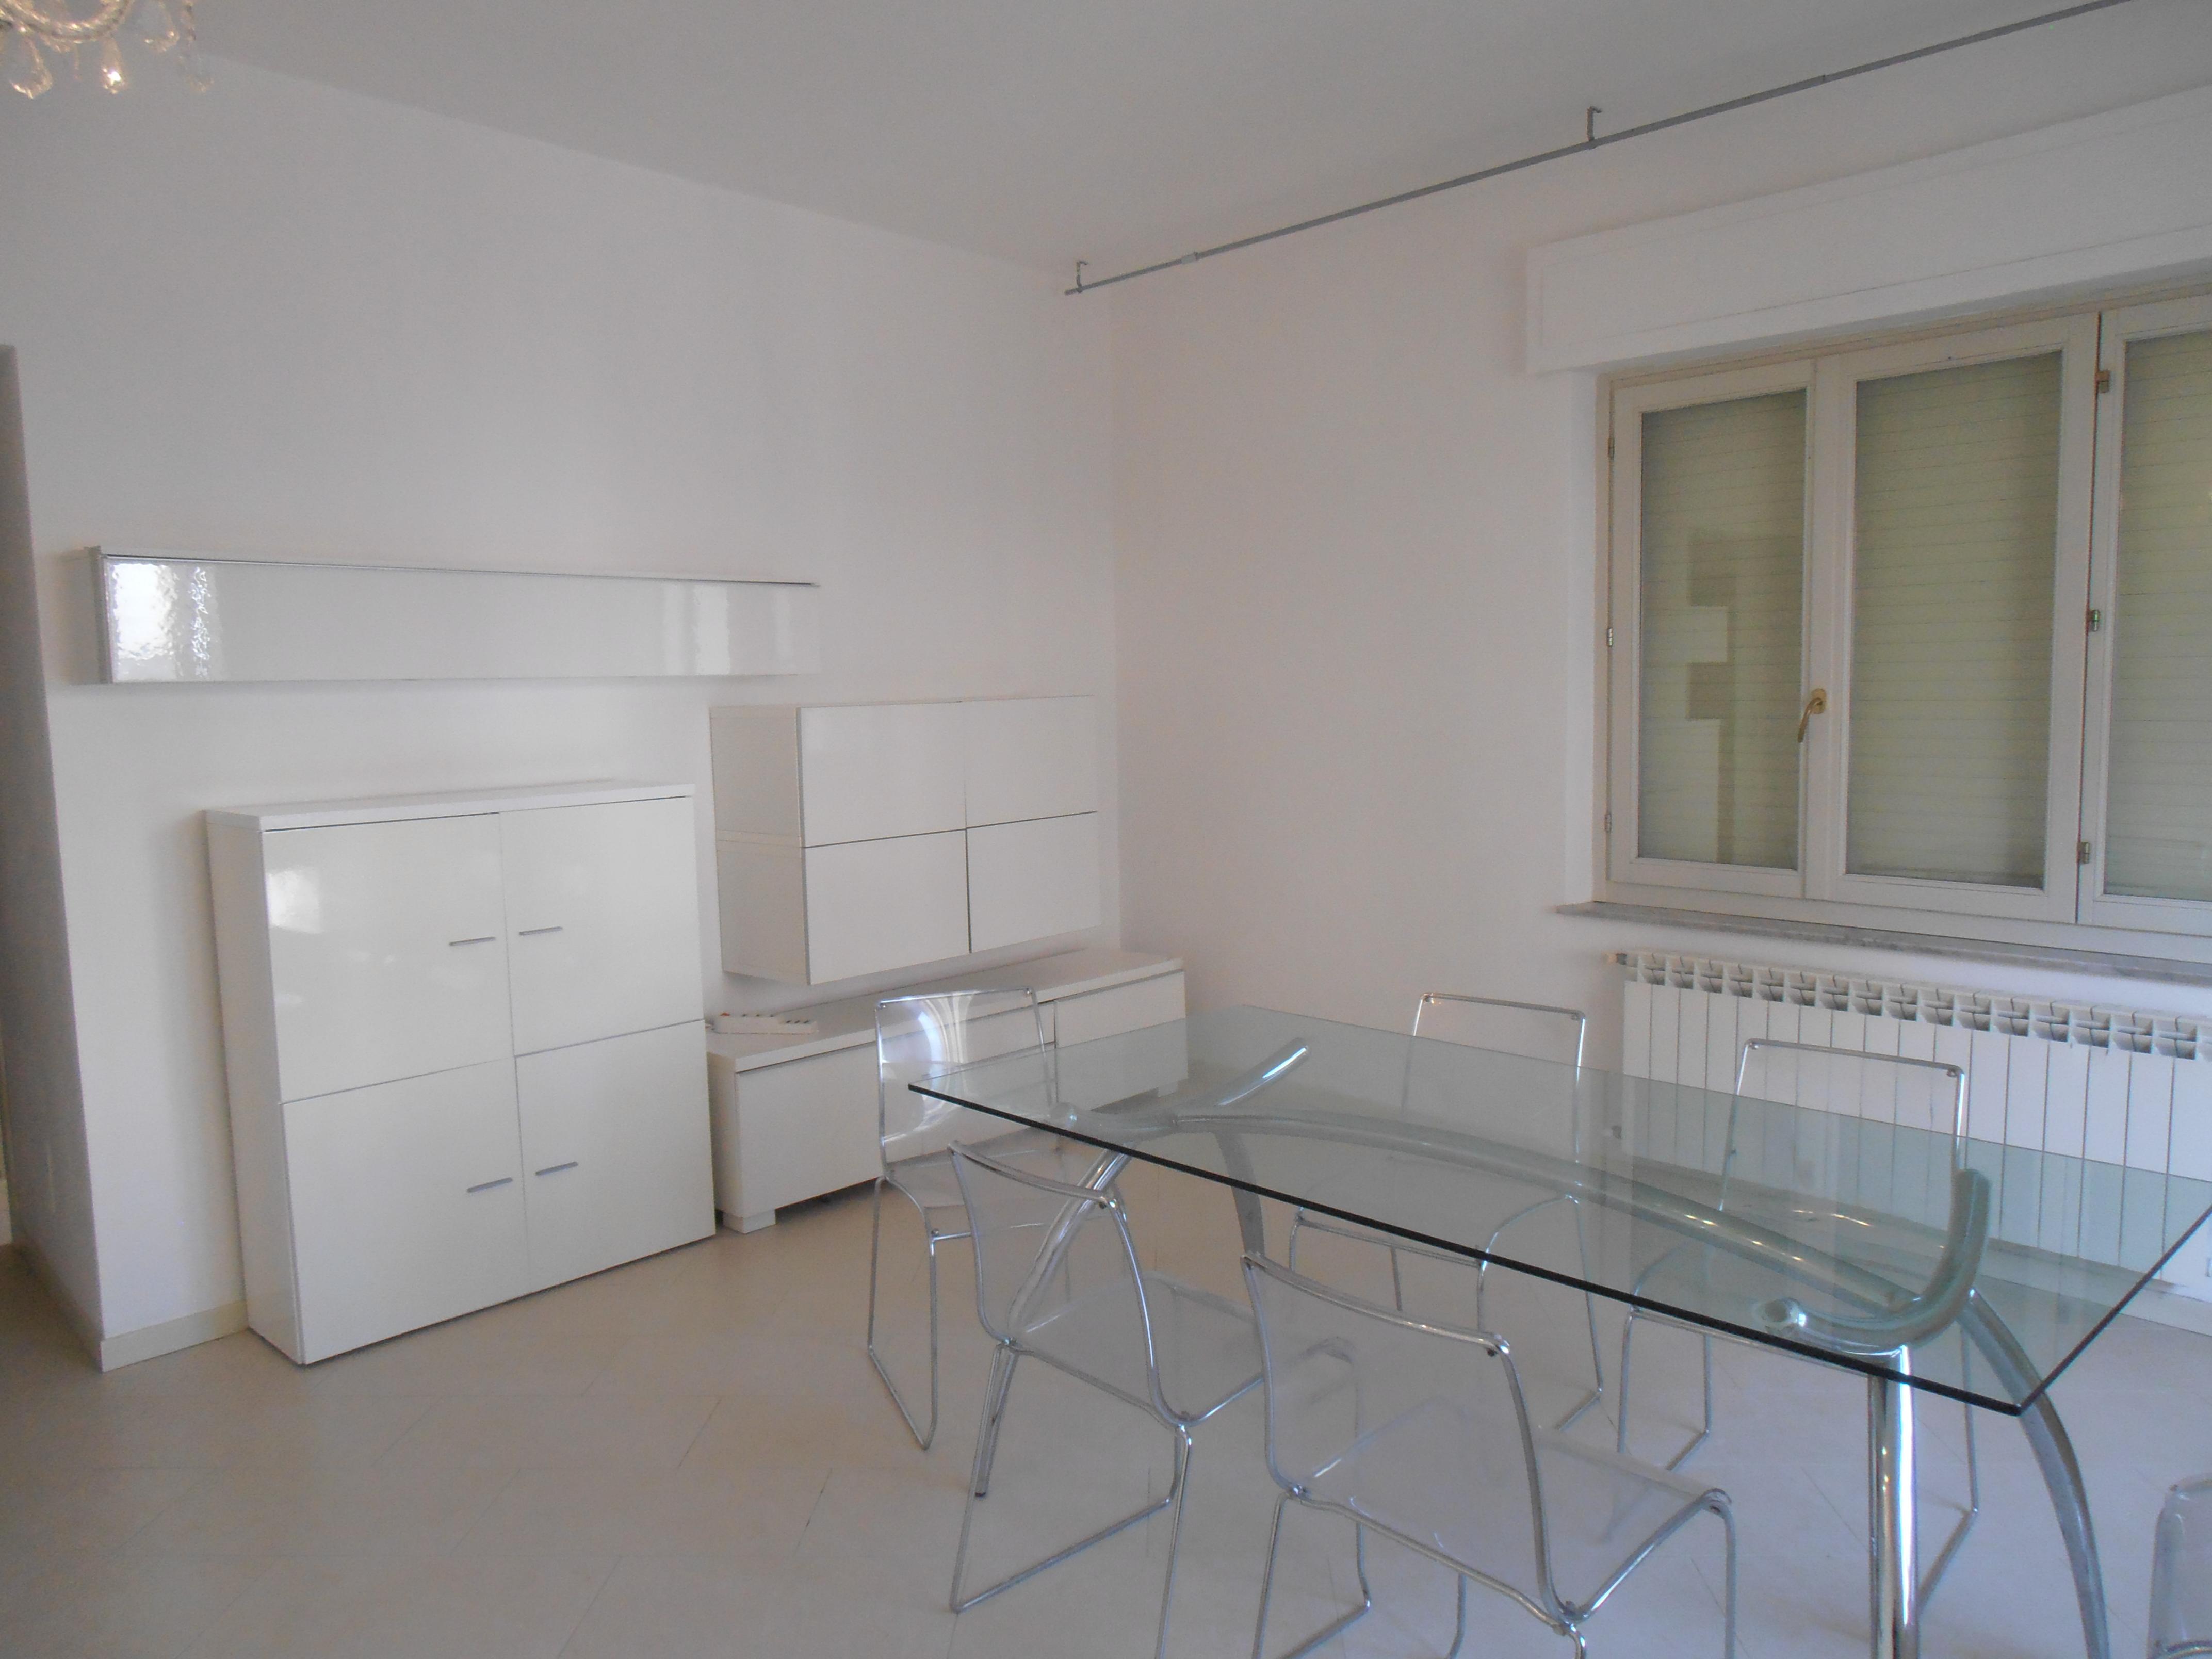 24265_viareggio passeggiata_Viareggio_Vendita_Appartamento